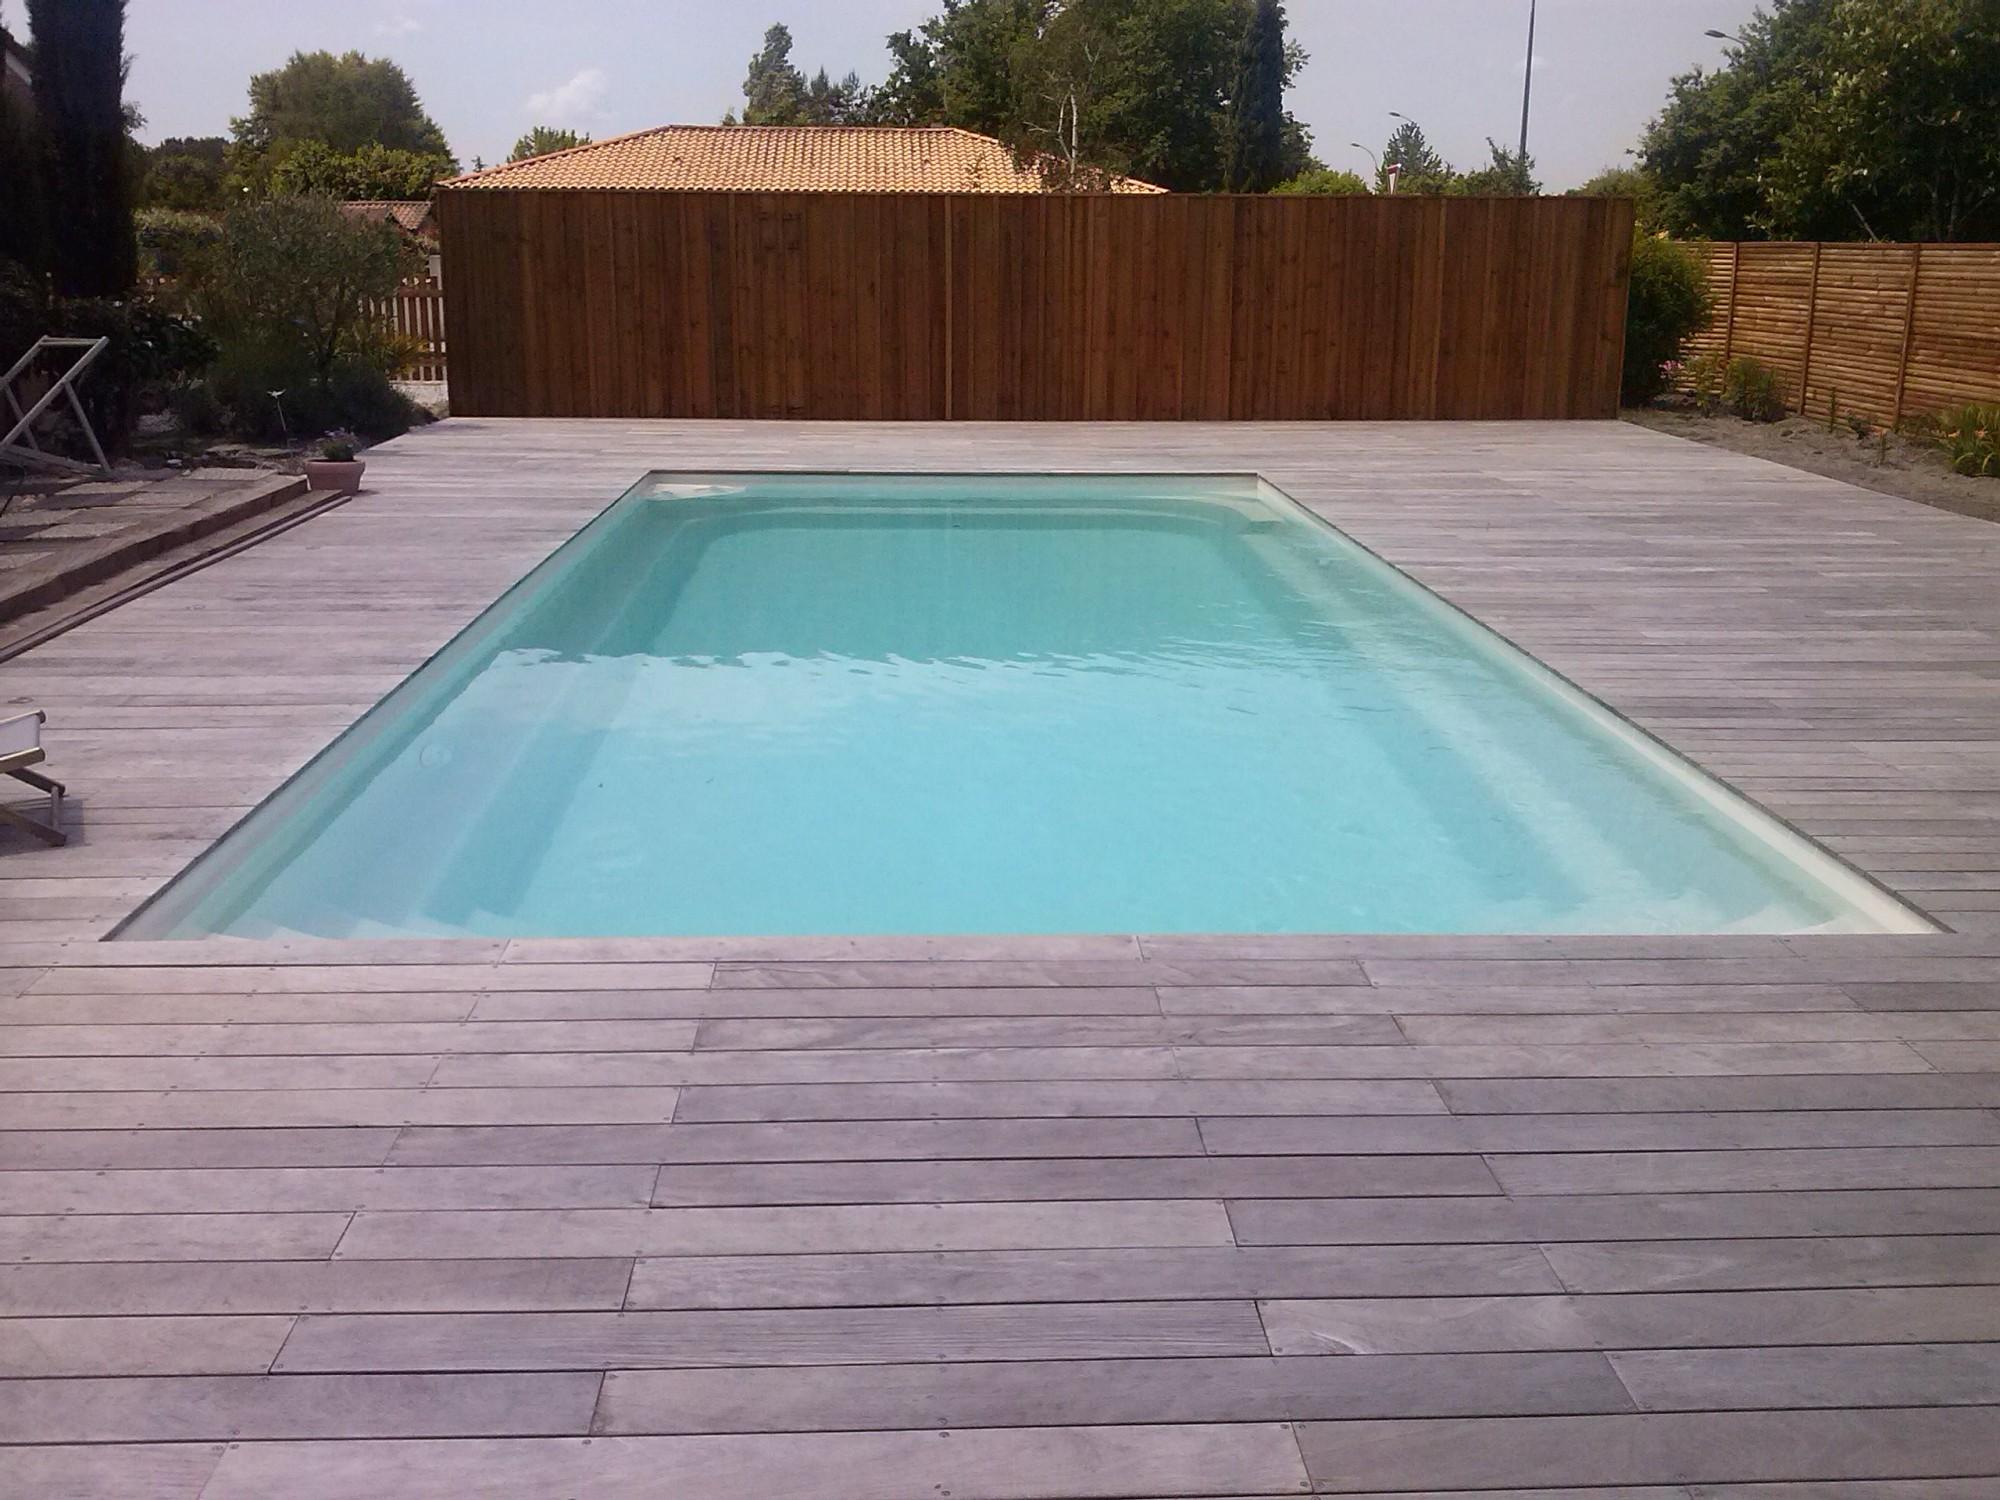 Terrasse bois exotique piscine nos conseils for Piscine sur pilotis